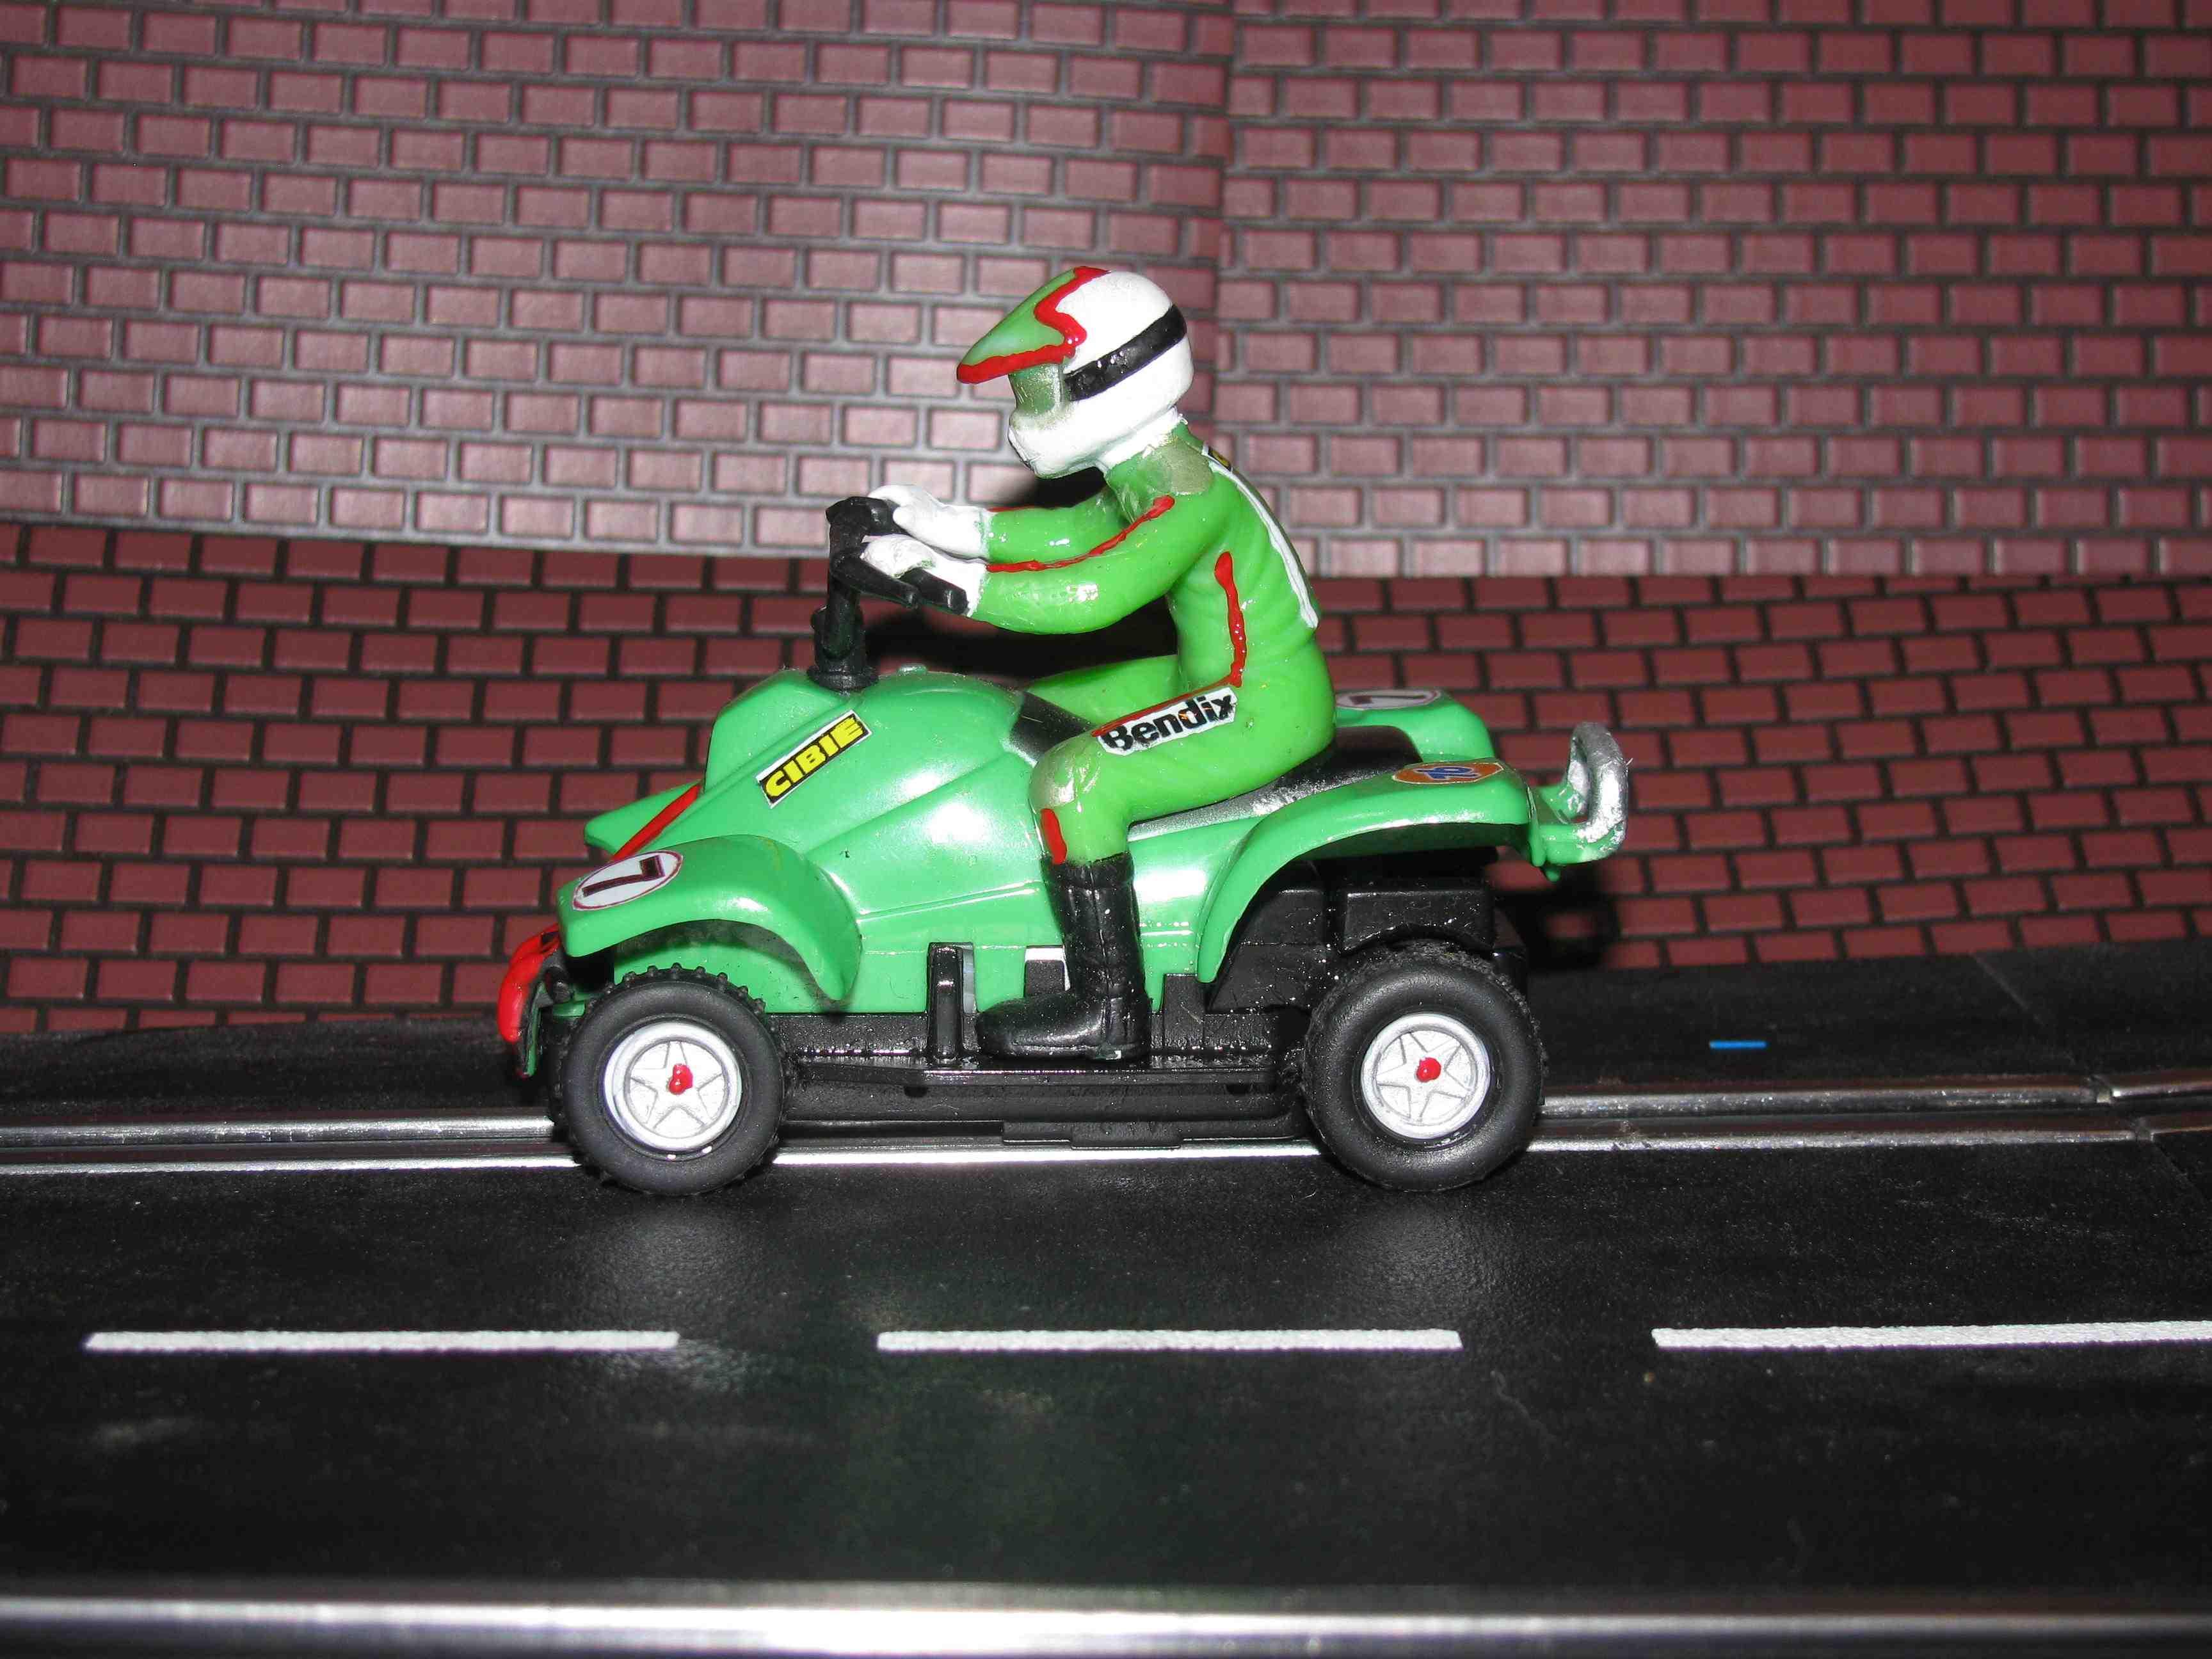 *** SOLD *** Slot Car 1/43 scale QUAD ATV Slot Car Racer #7 – Green